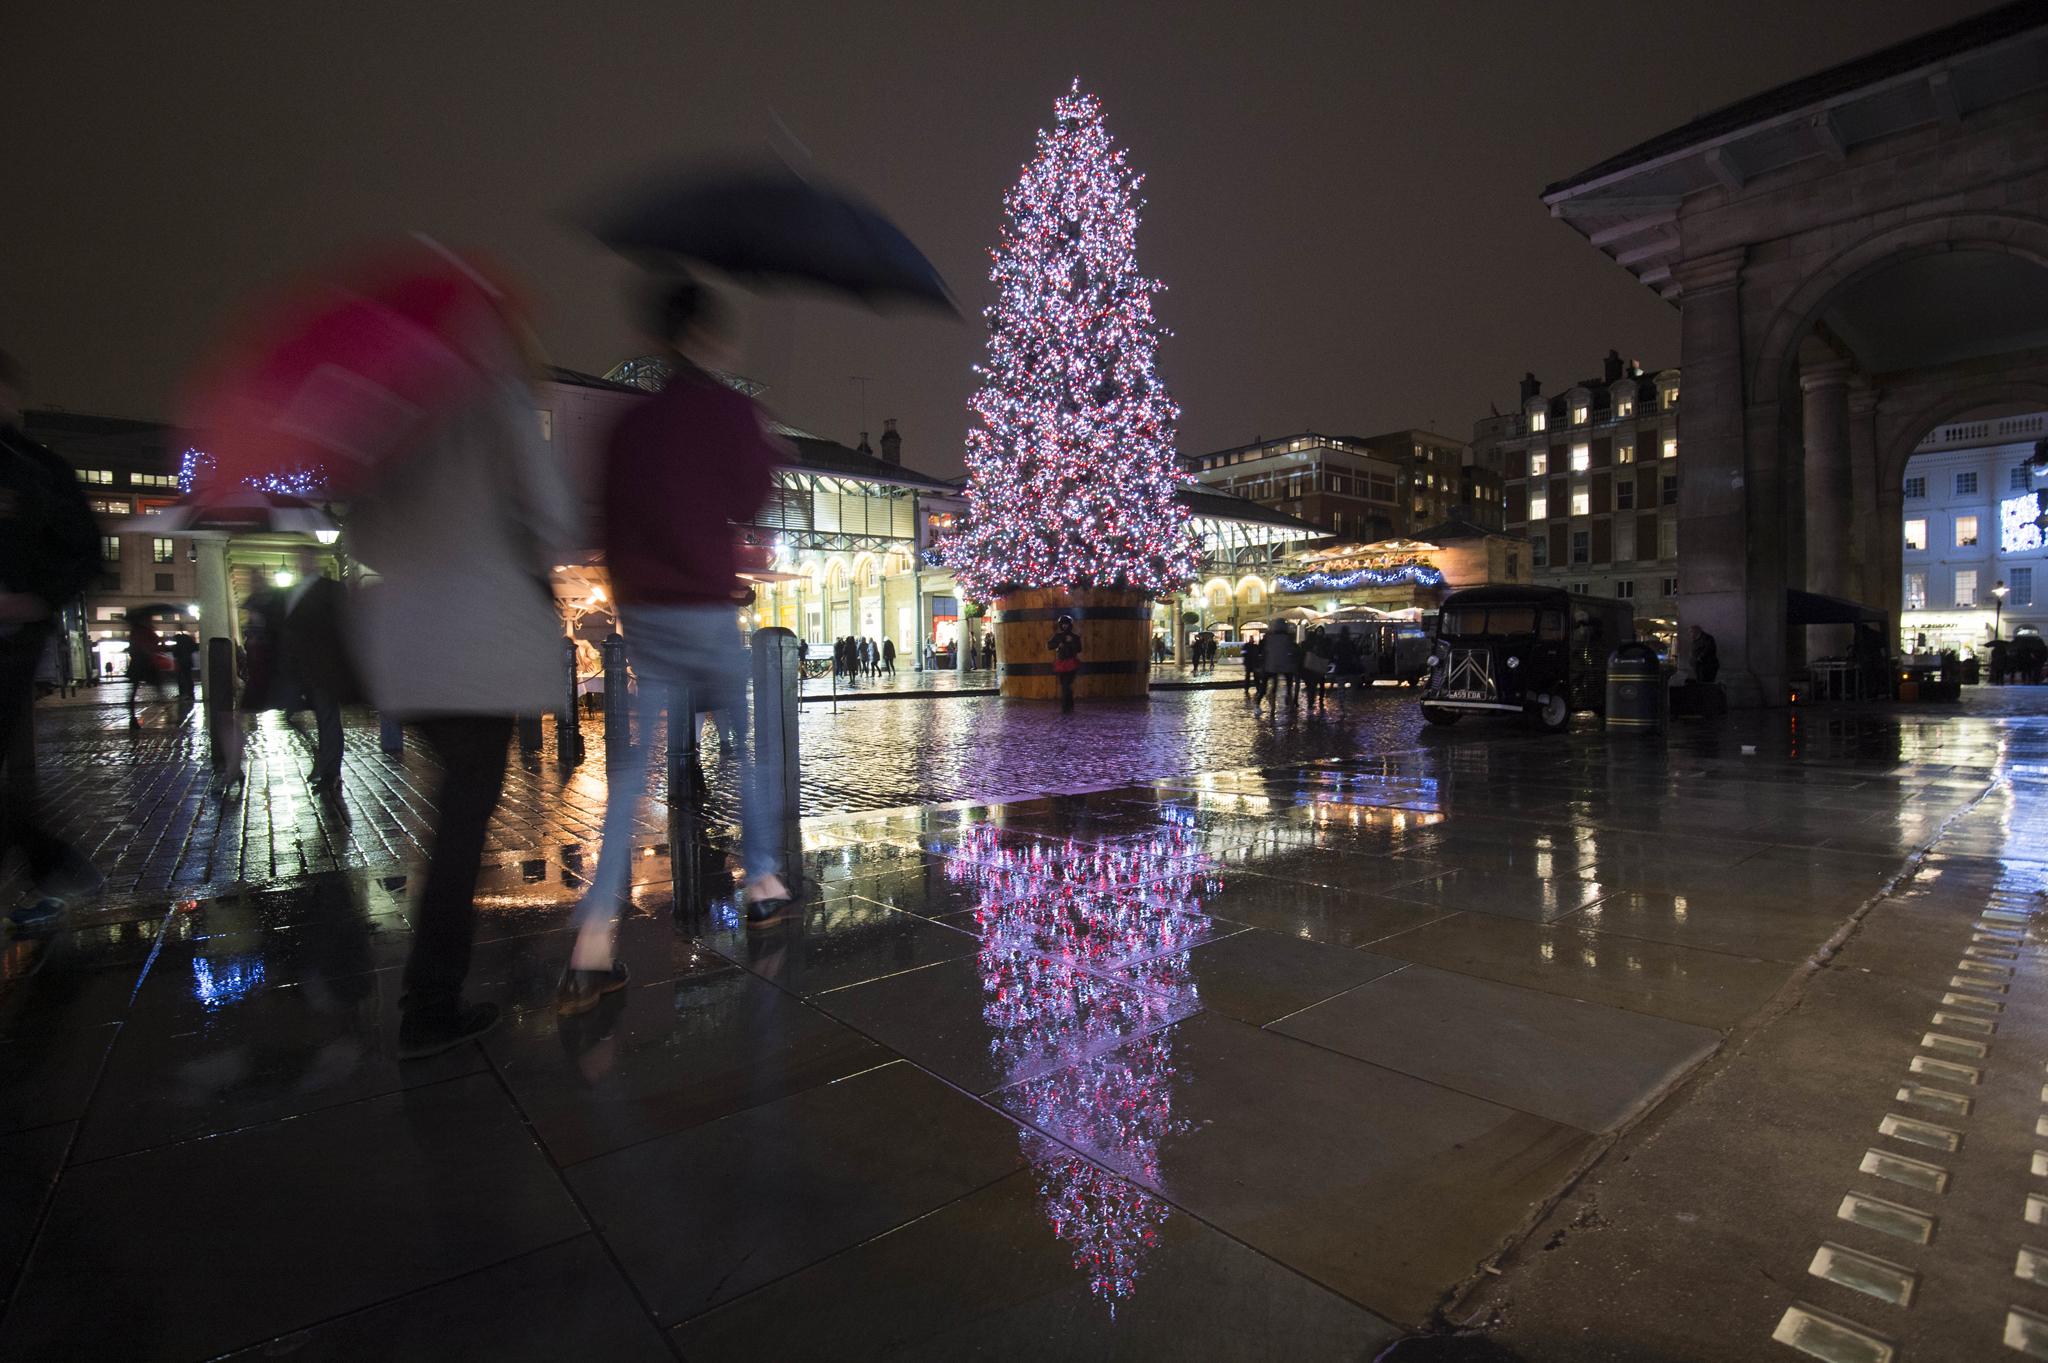 Covent Garden Christmas tree 2014